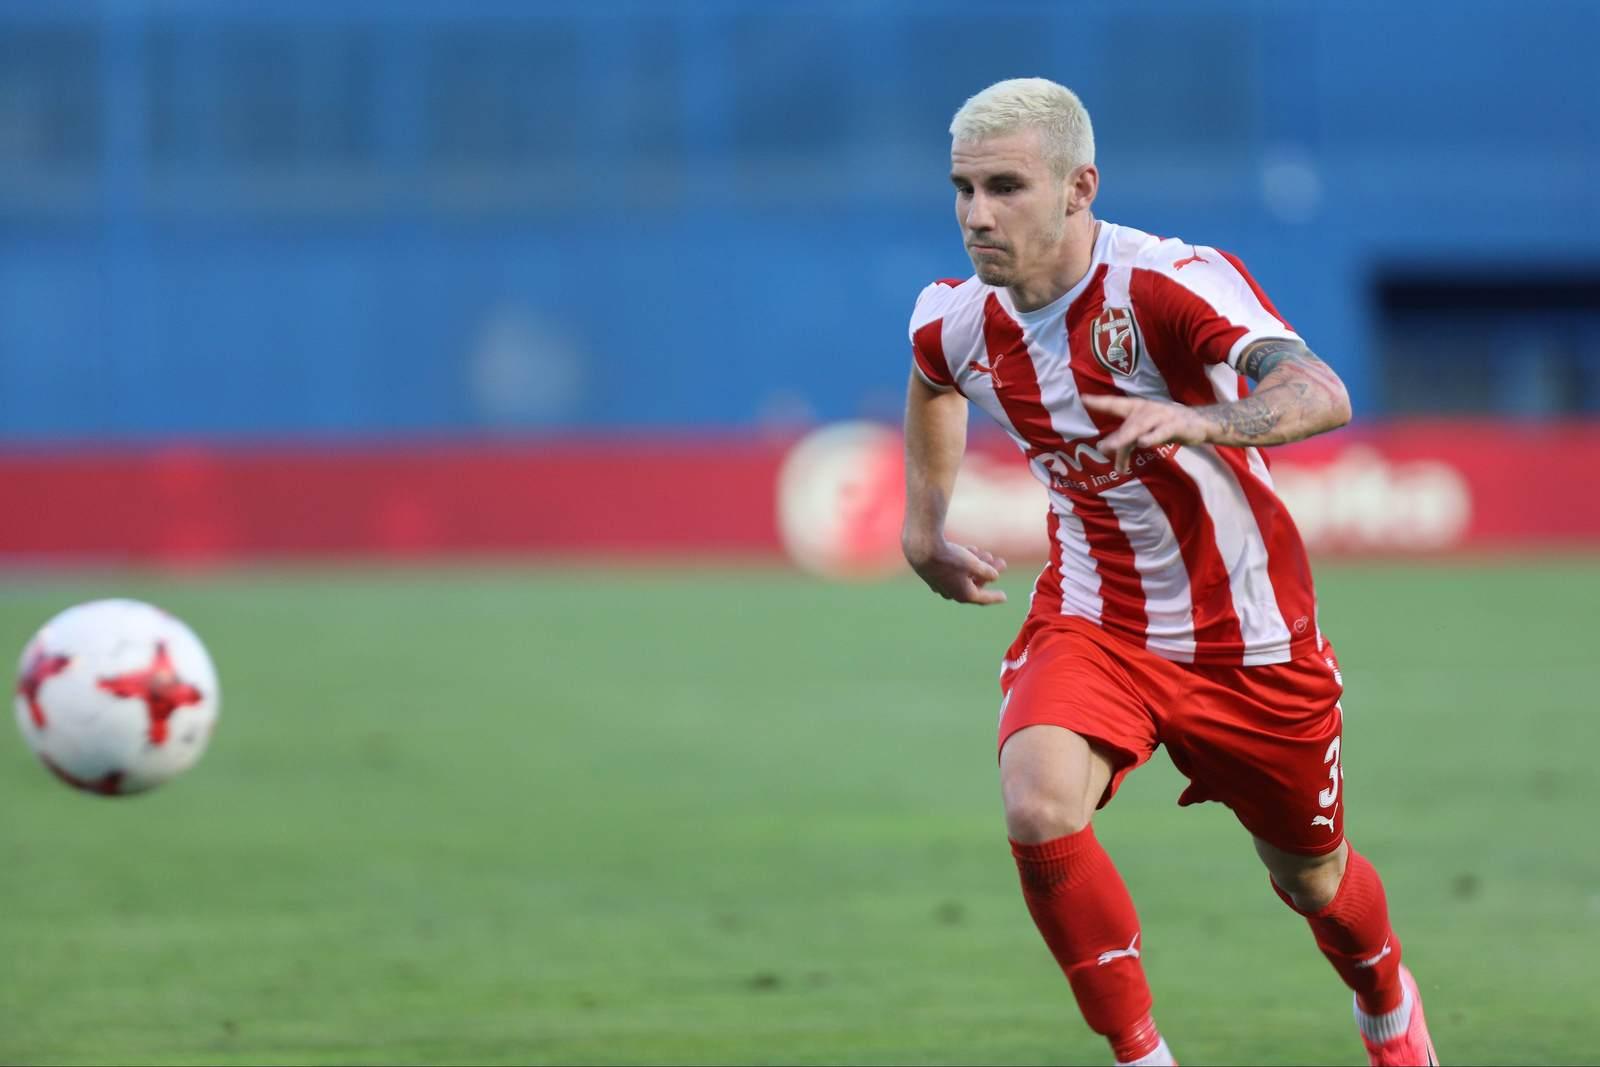 Gledi Mici am Ball für Skenderbeu. Jetzt auf die Partie Dynamo Kiew gegen Skenderbeu Korce wetten